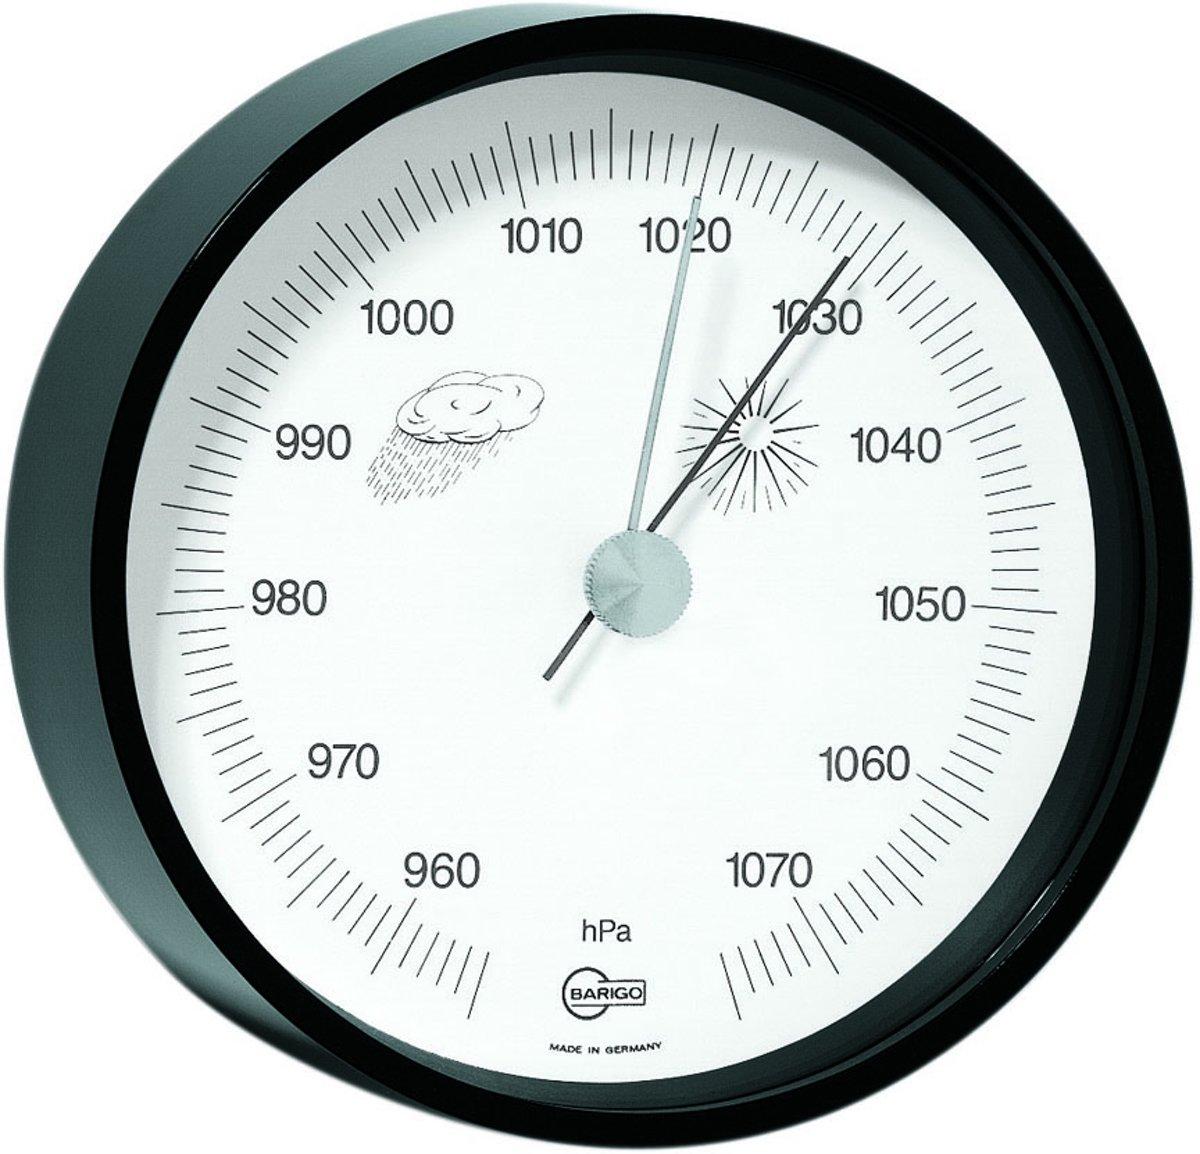 Barigo 115zw barometer messing zwart gelakt kopen